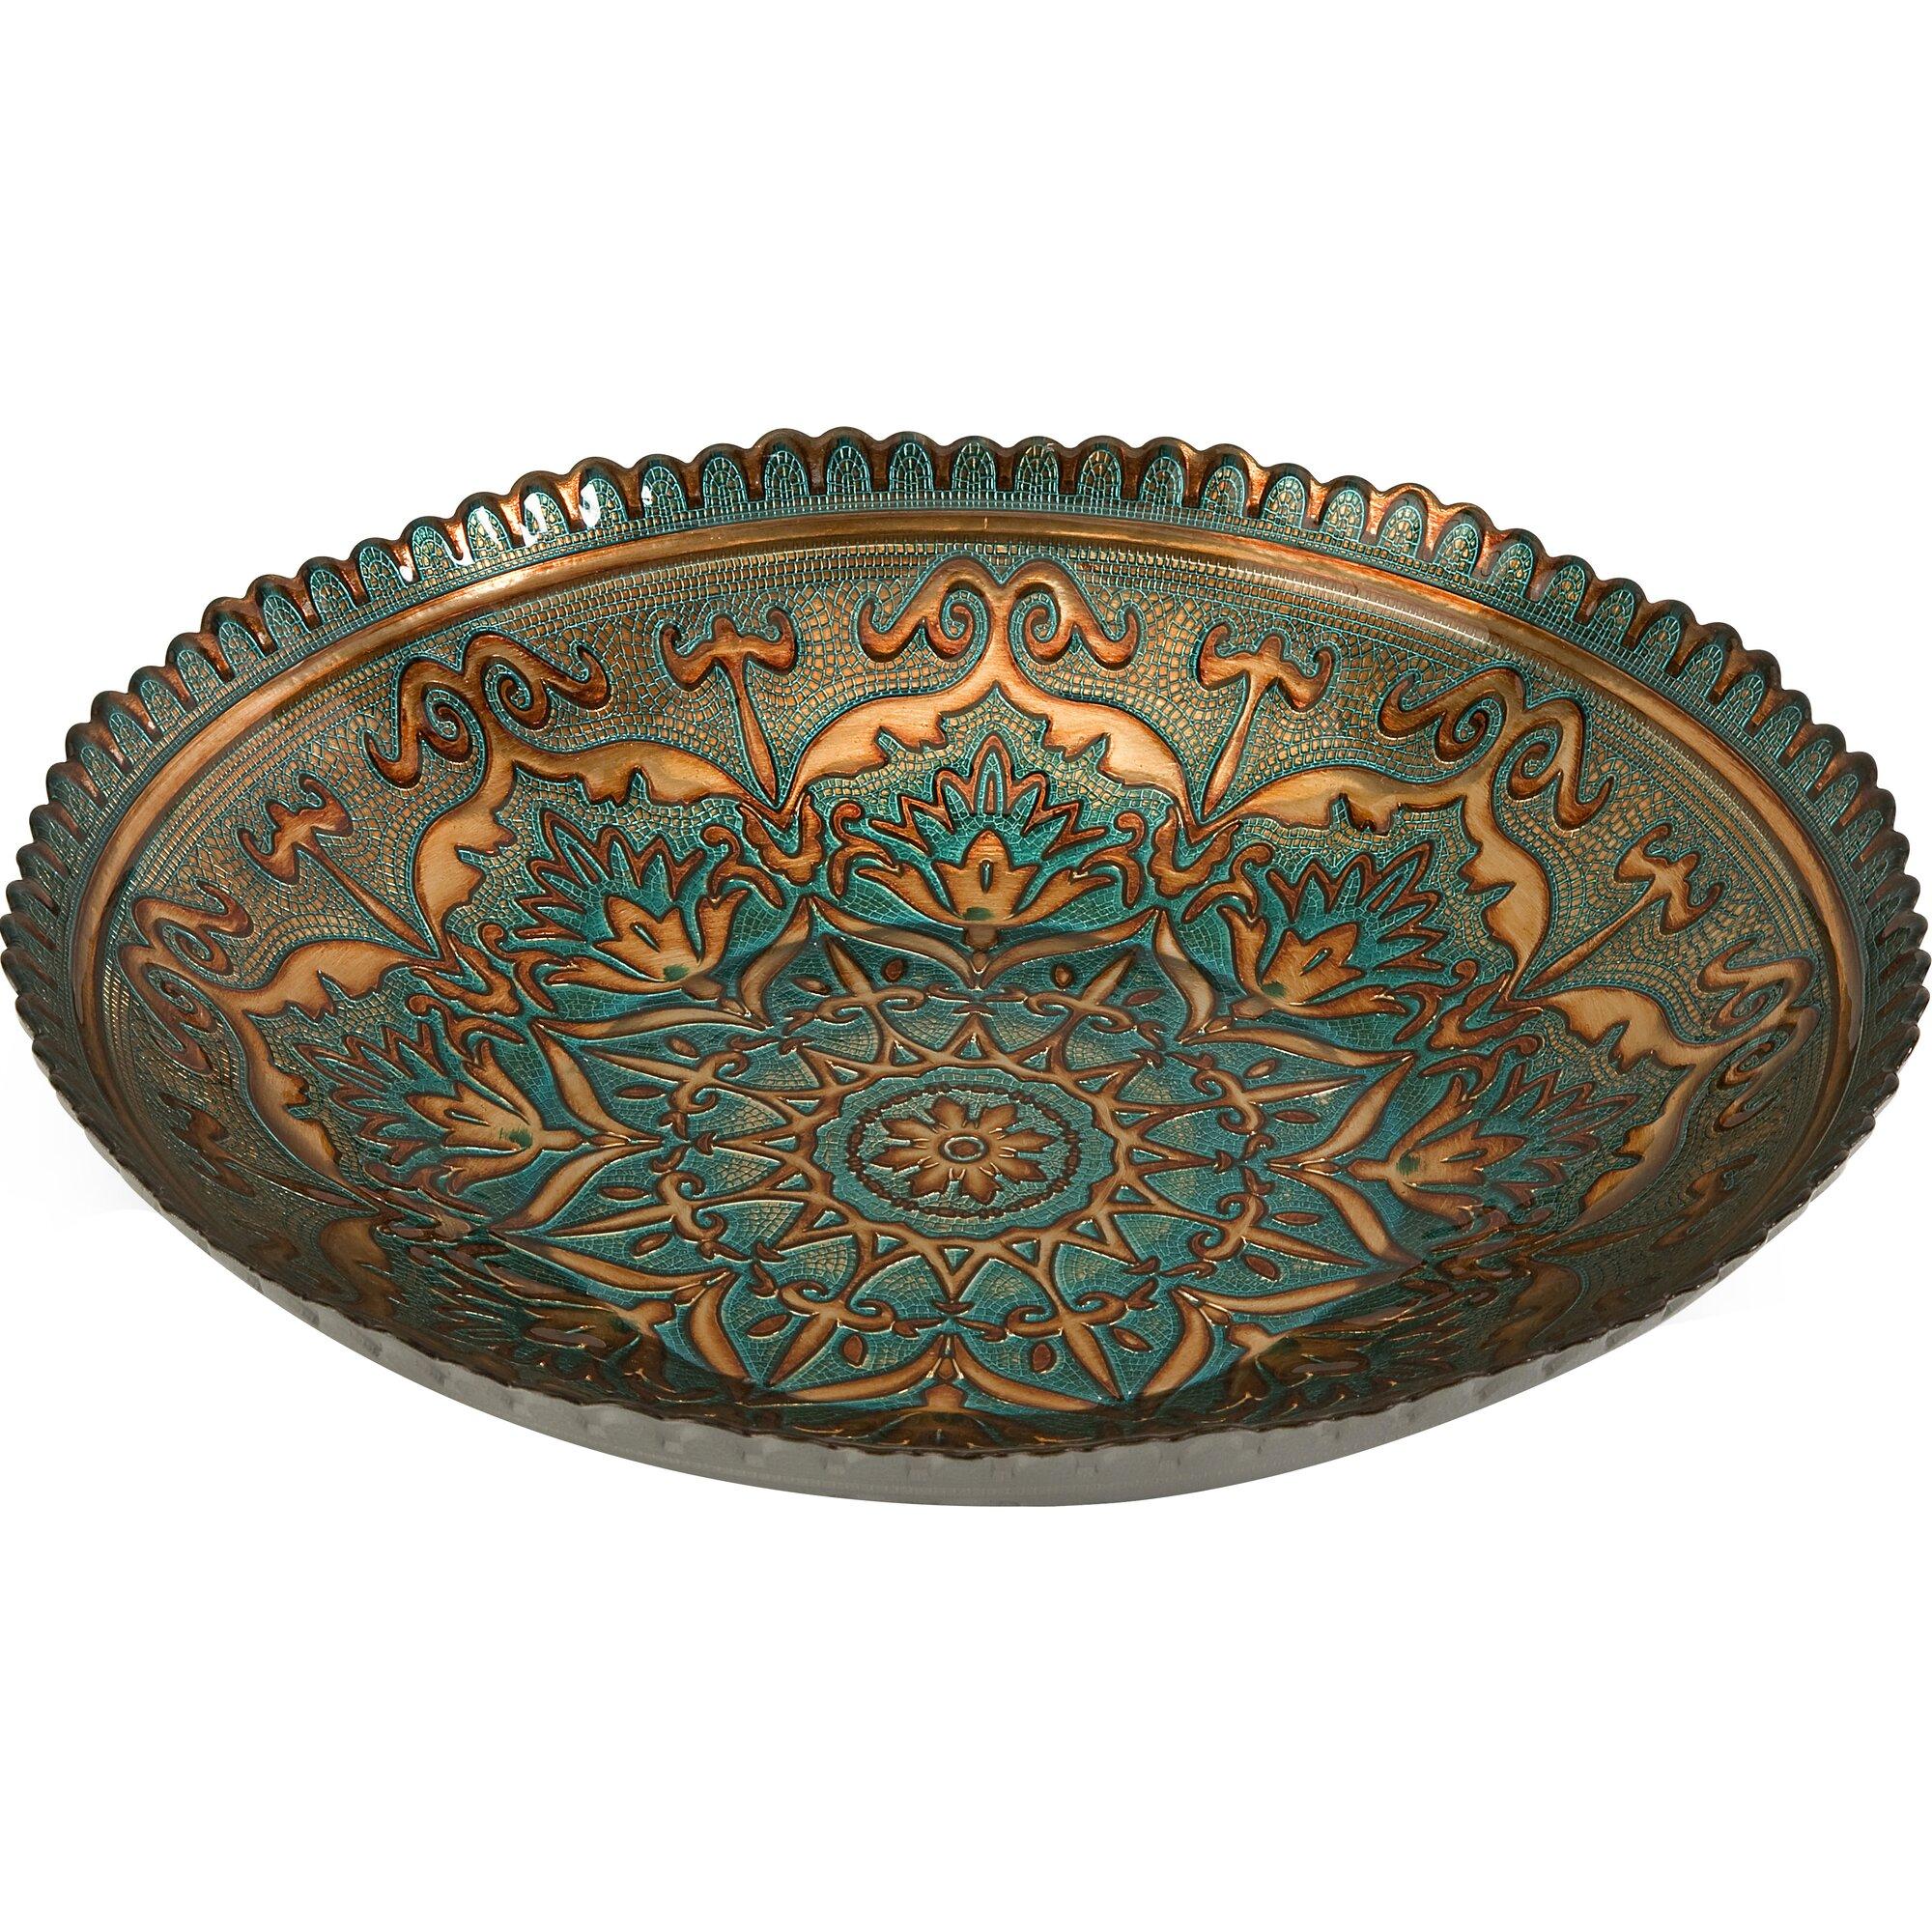 ravenna glass decorative bowl - Decorative Bowl